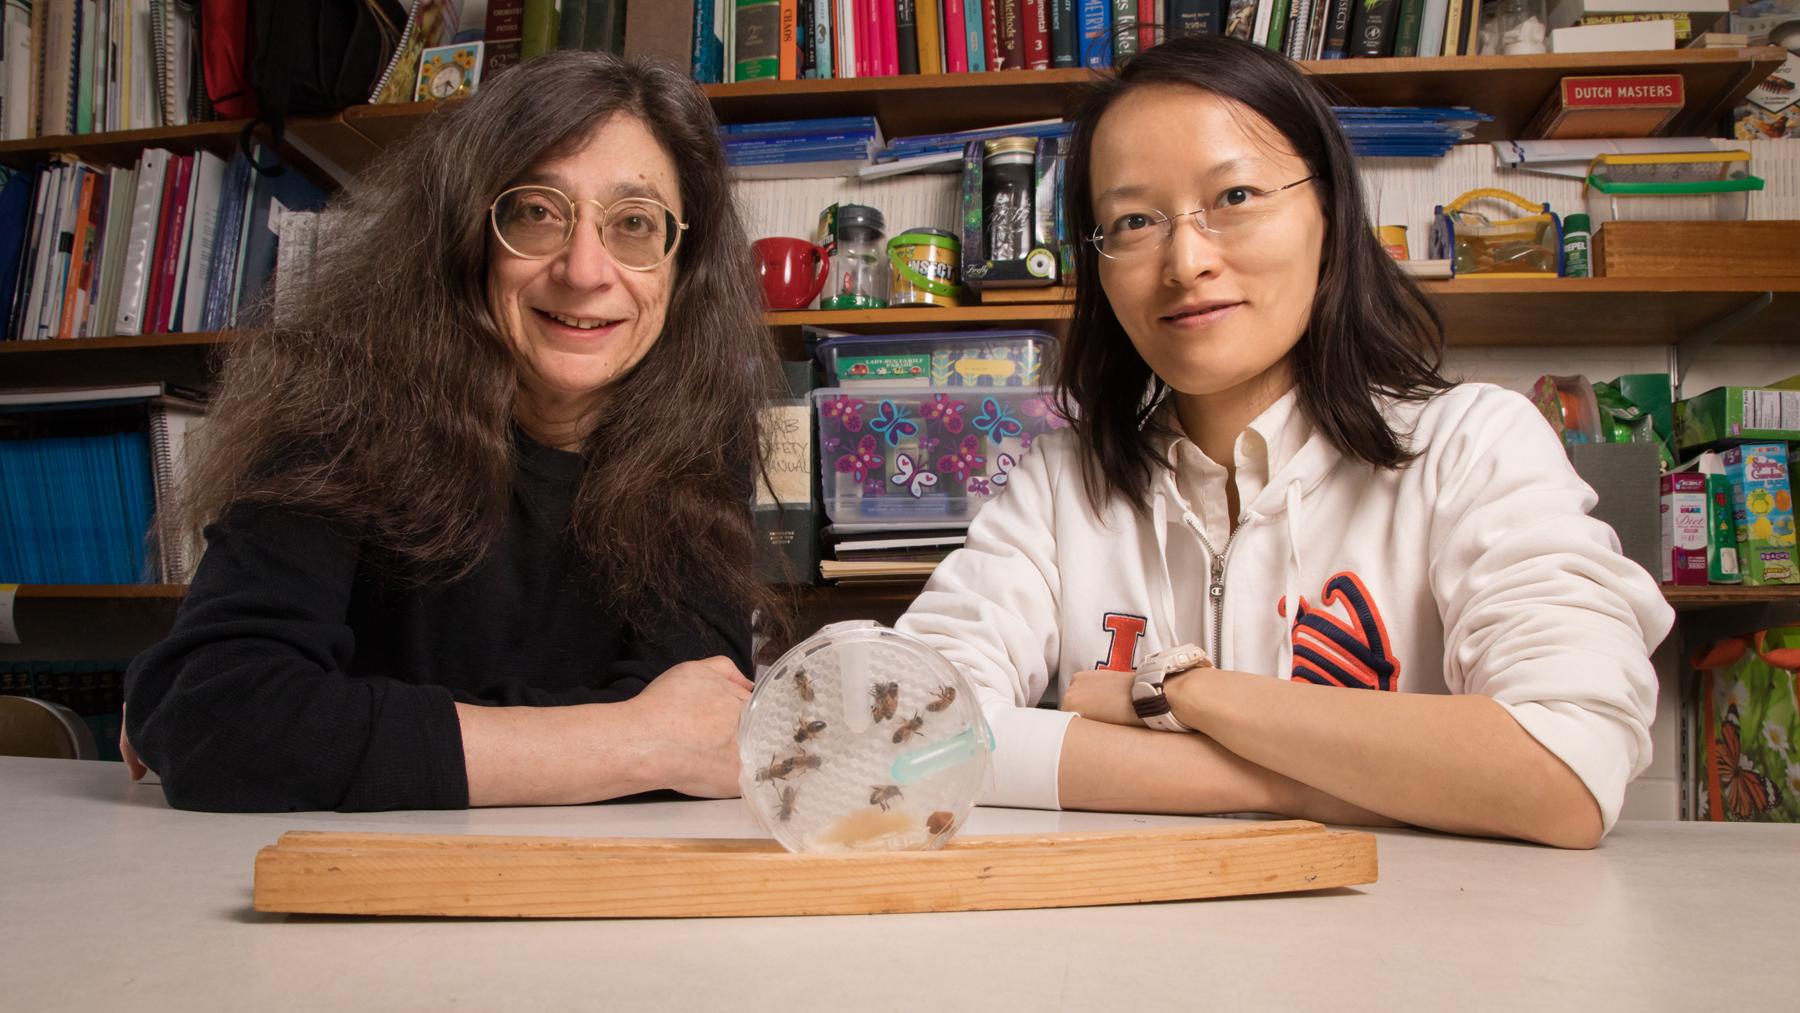 Entomology professor May Berenbaum and postdoctoral researcher Ling-Hsiu Liao. Photo by L. B. Stauffer